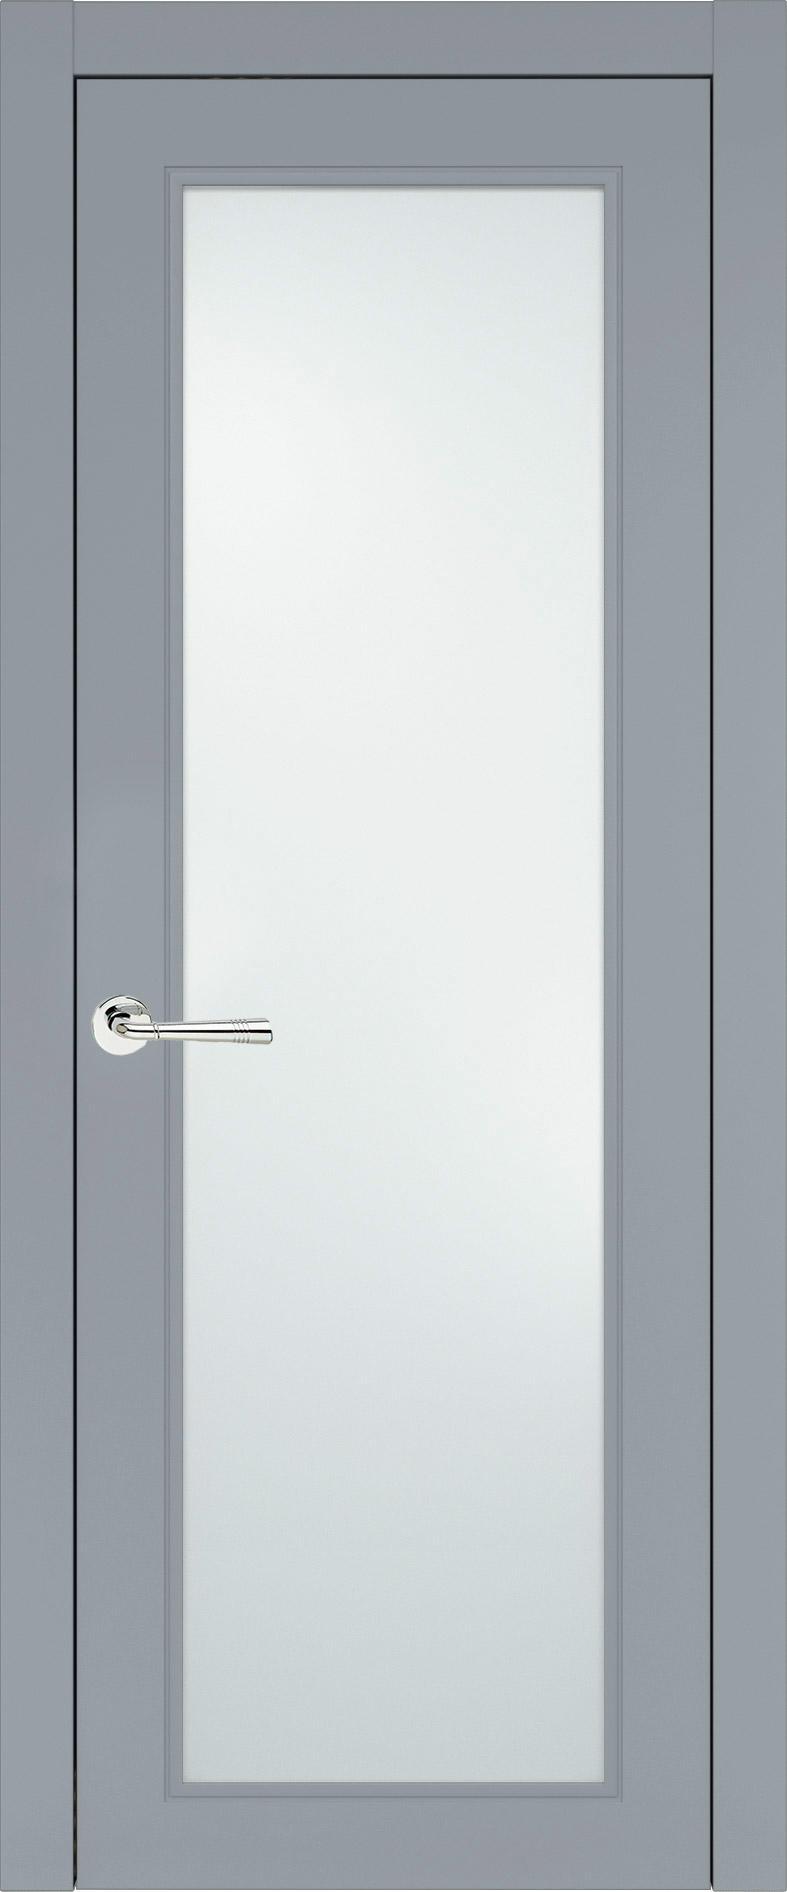 Domenica Neo Classic цвет - Серебристо-серая эмаль (RAL 7045) Со стеклом (ДО)